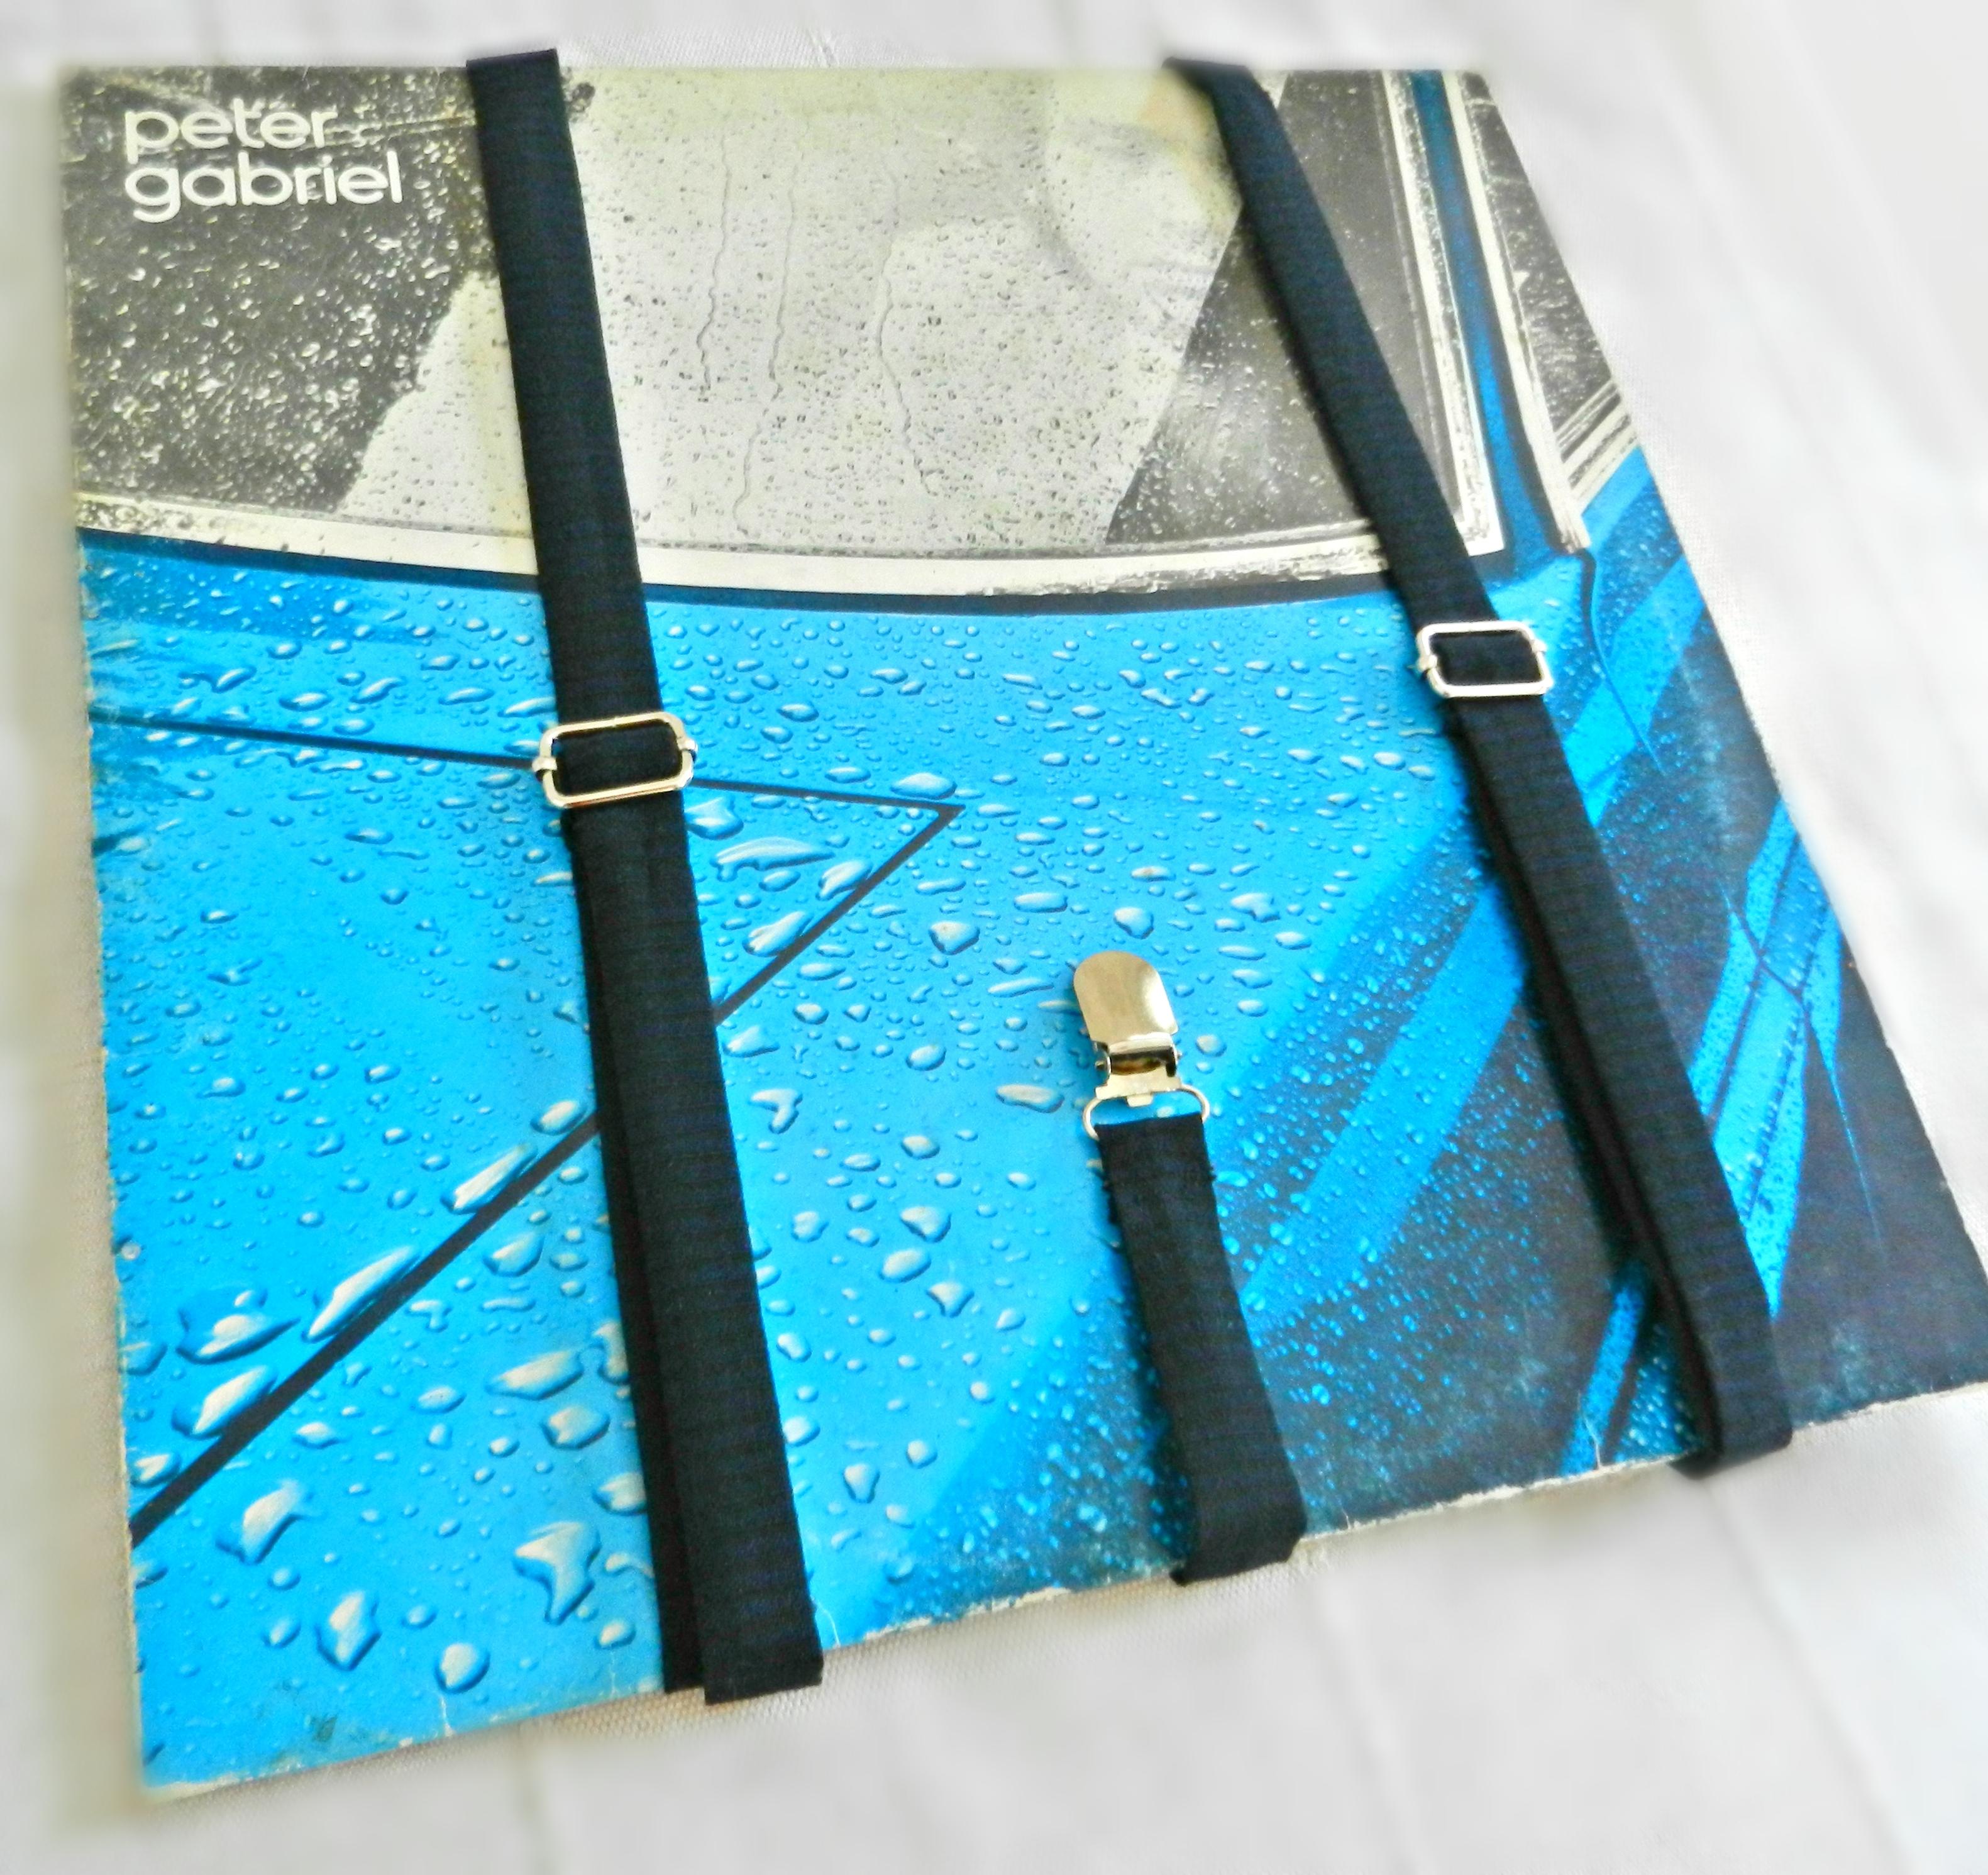 Blu strisce Nere - Pezzi Unici1